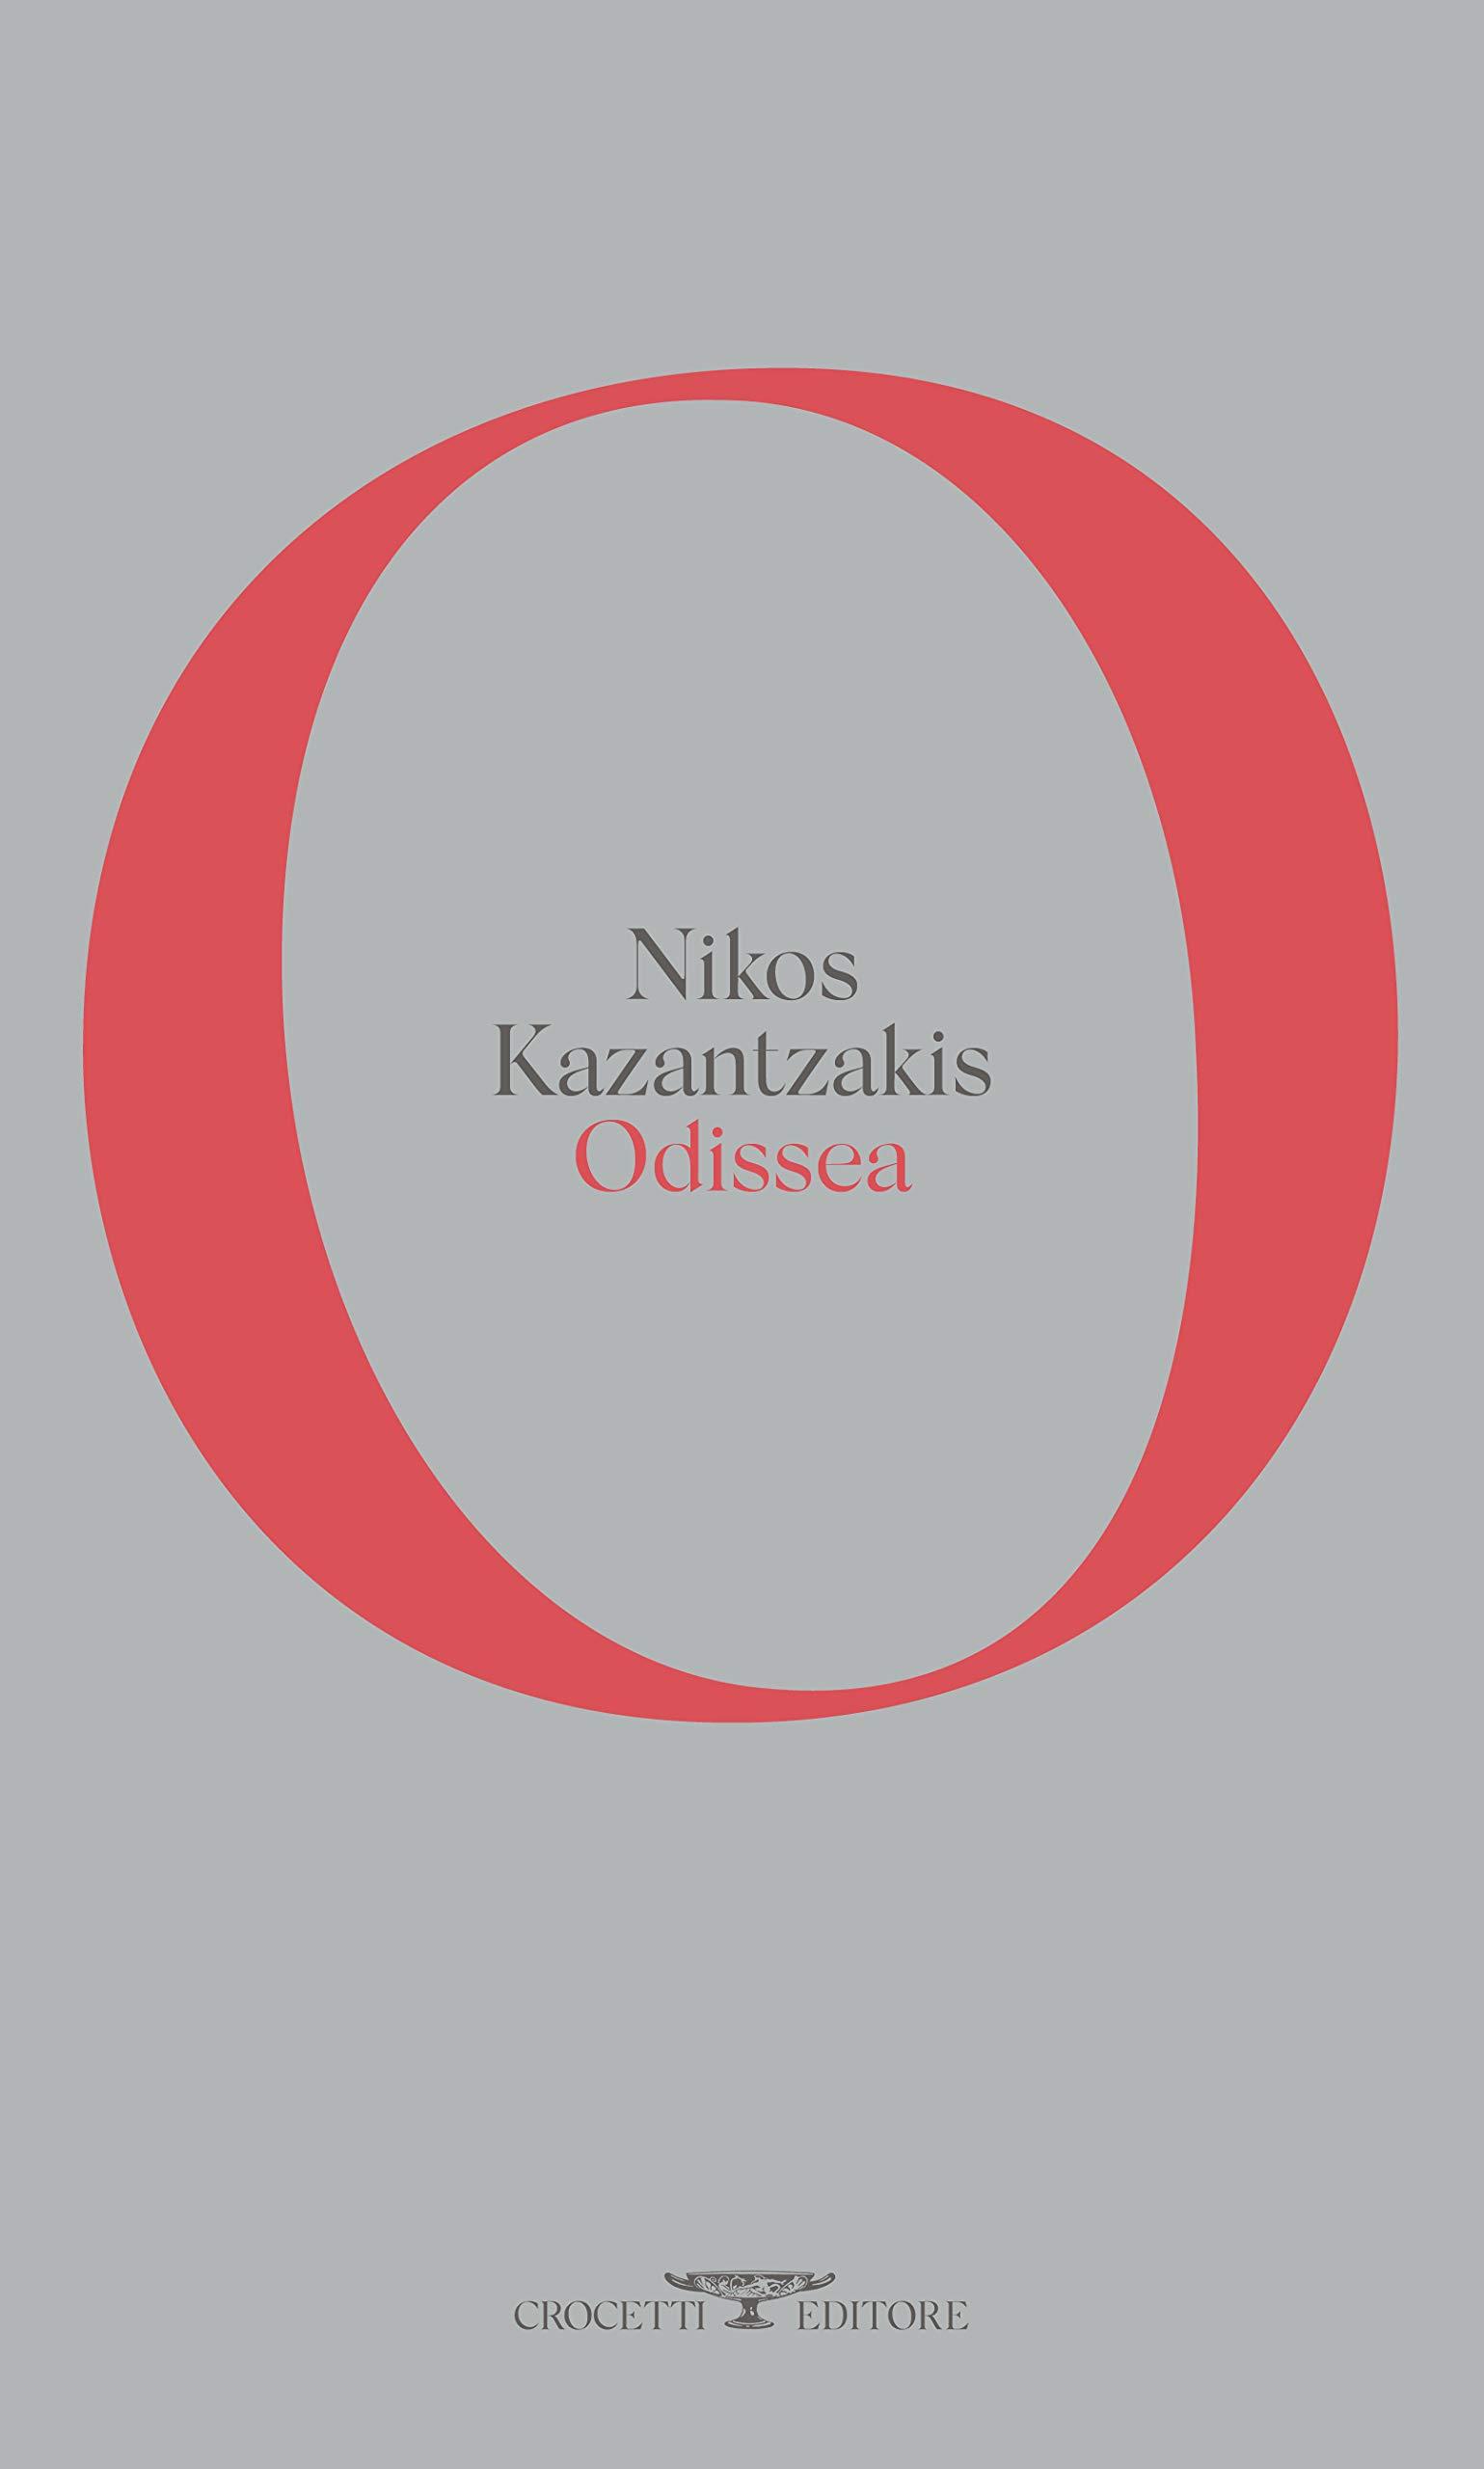 Amazon.it: Odissea - Kazantzakis, Nikos, Crocetti, Nicola - Libri